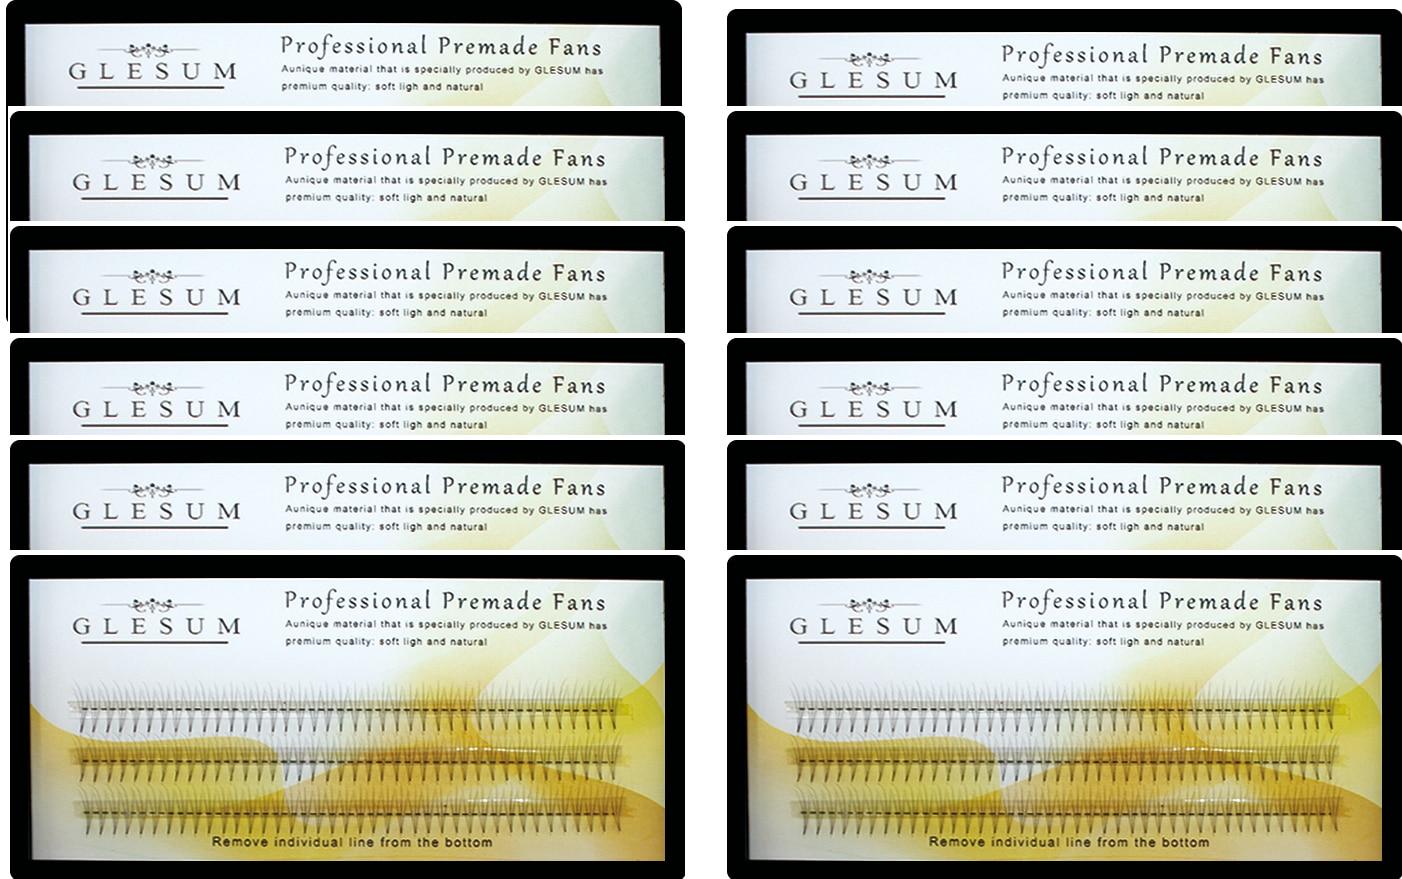 Glesum 10 Trays Set Volume 3D/4D/5D eyelashes C Curl Short-Stem Pre Made Fans, Silk Soft Lash Extension, False Mink Lashes